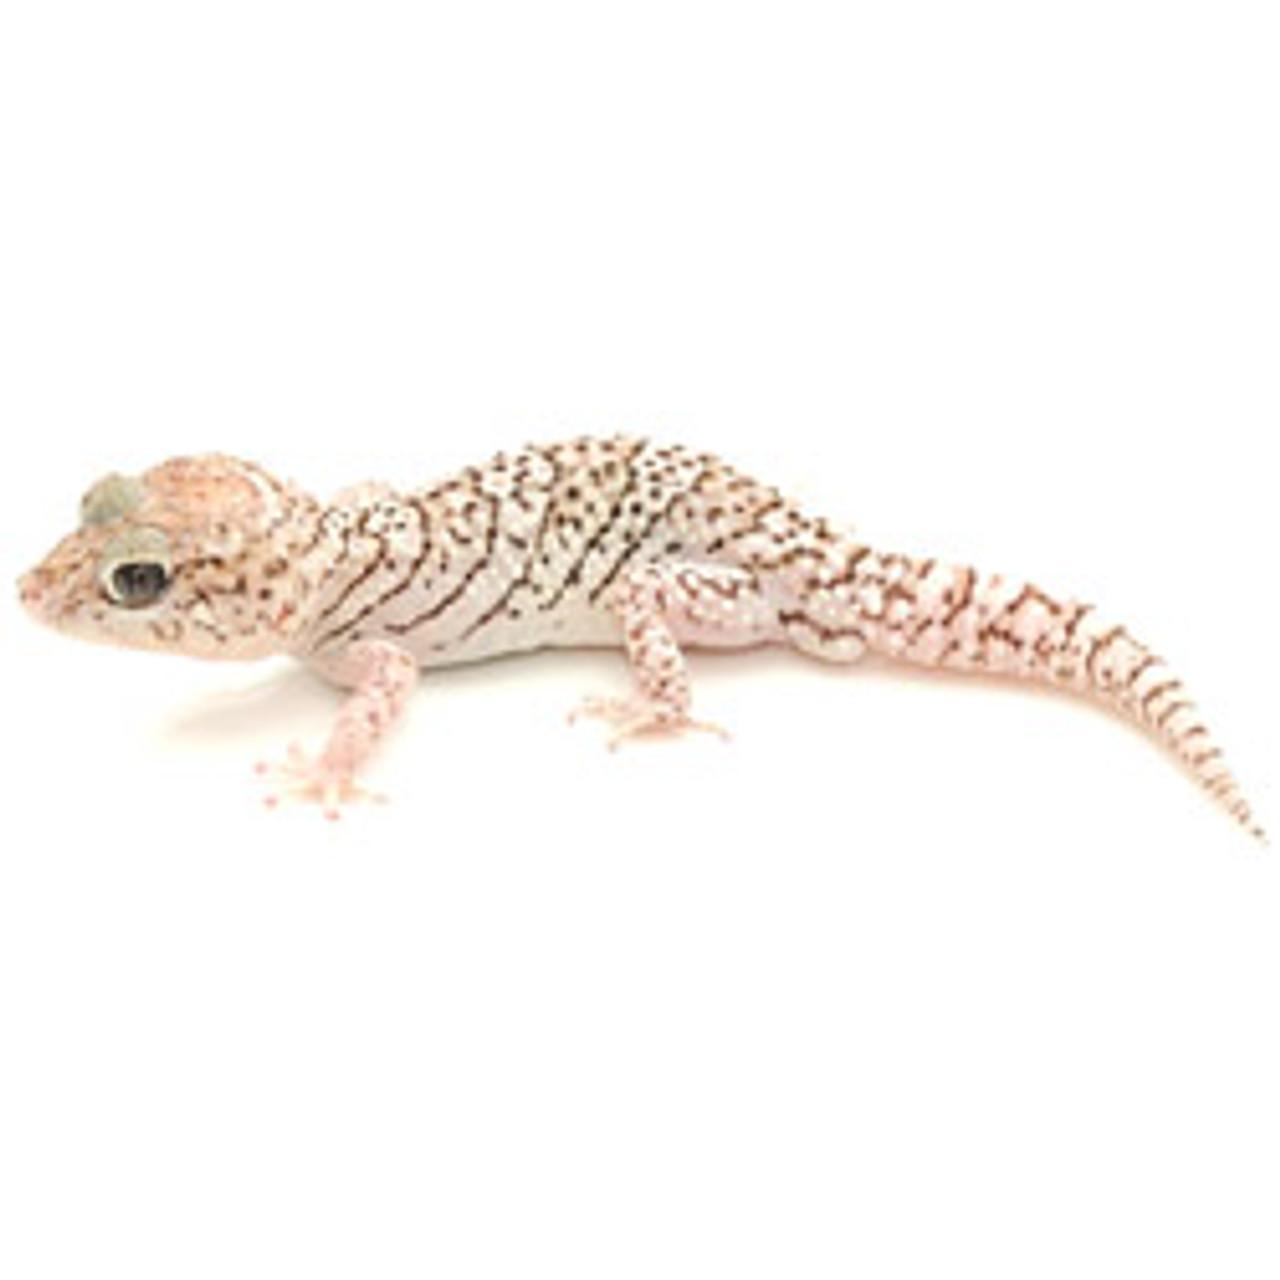 Anerythristic Panther Gecko (Pareodura pictus) Adult